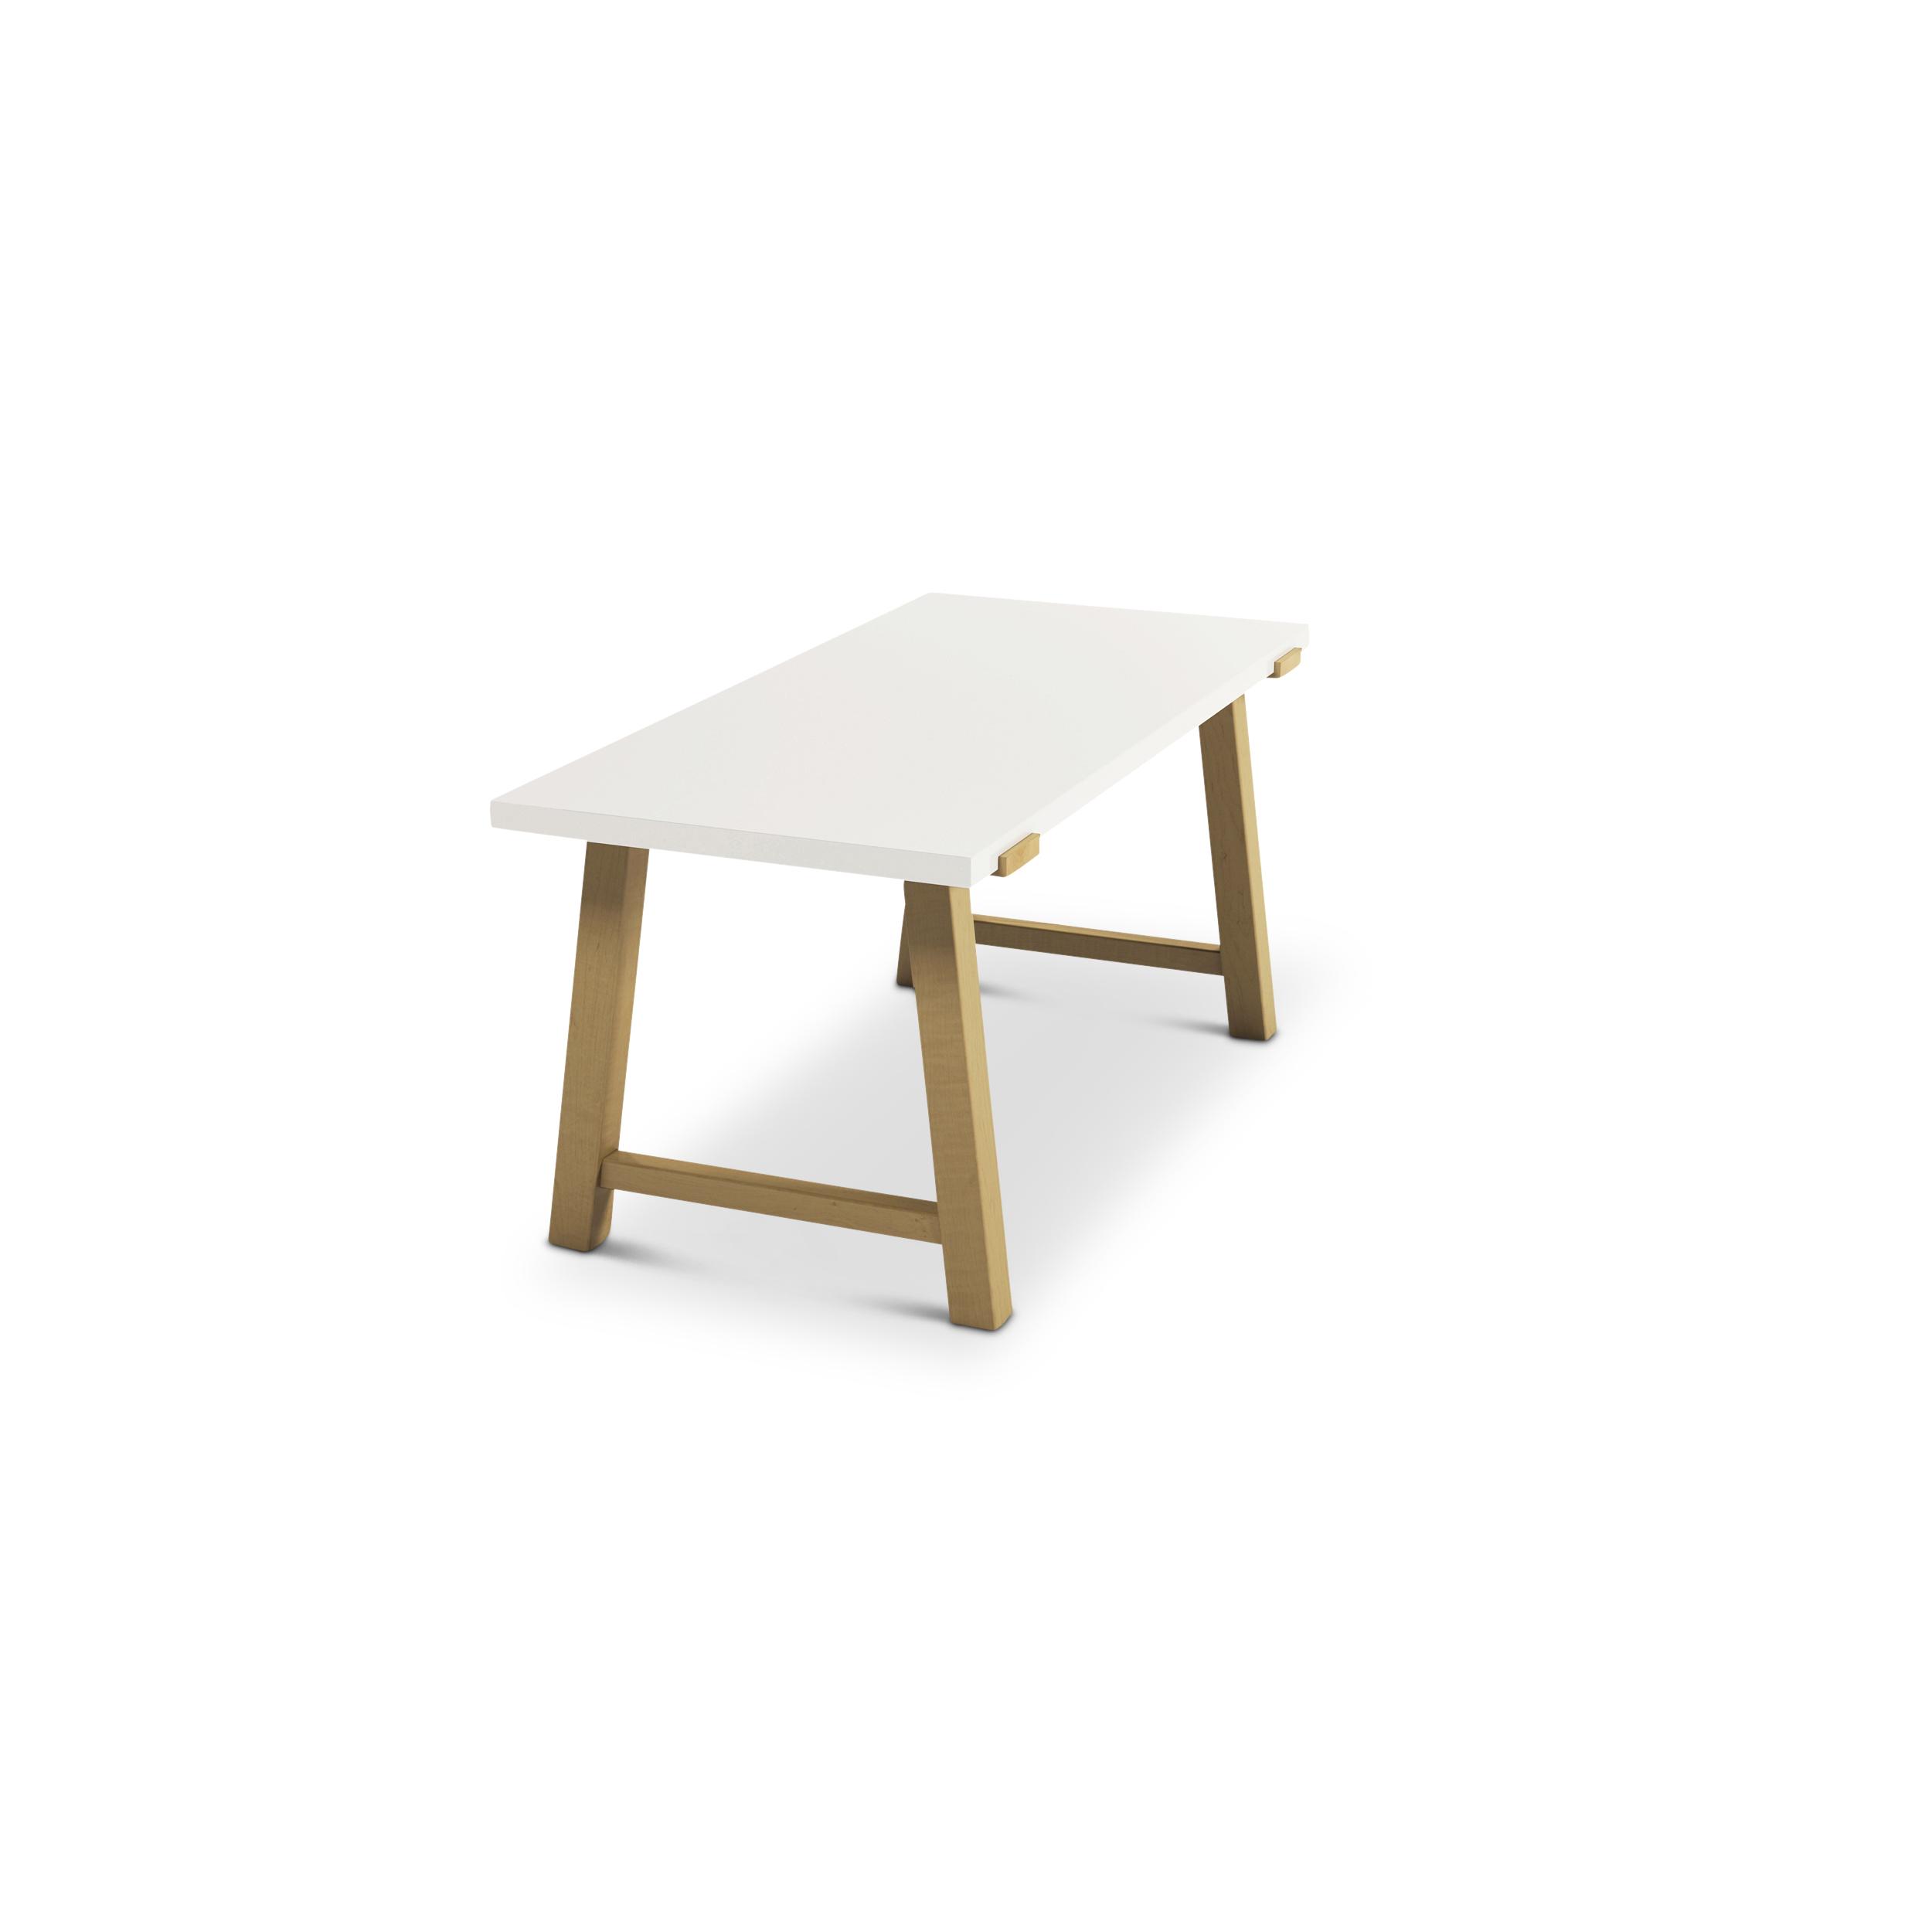 Maple Scandinavian Desk With Angled Legs